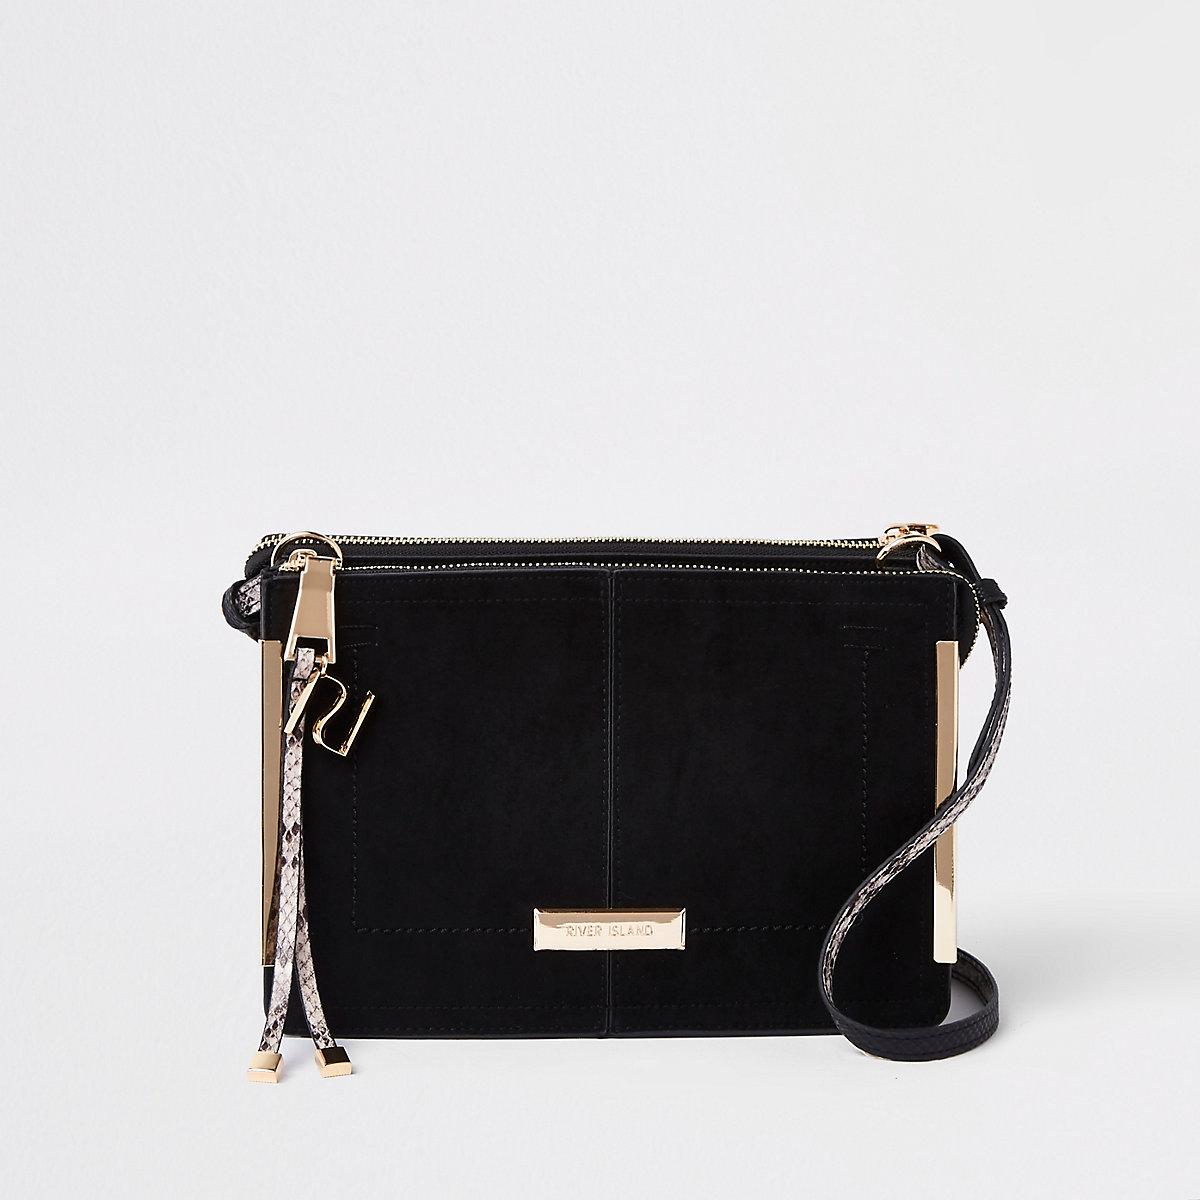 Black structured cross body bag